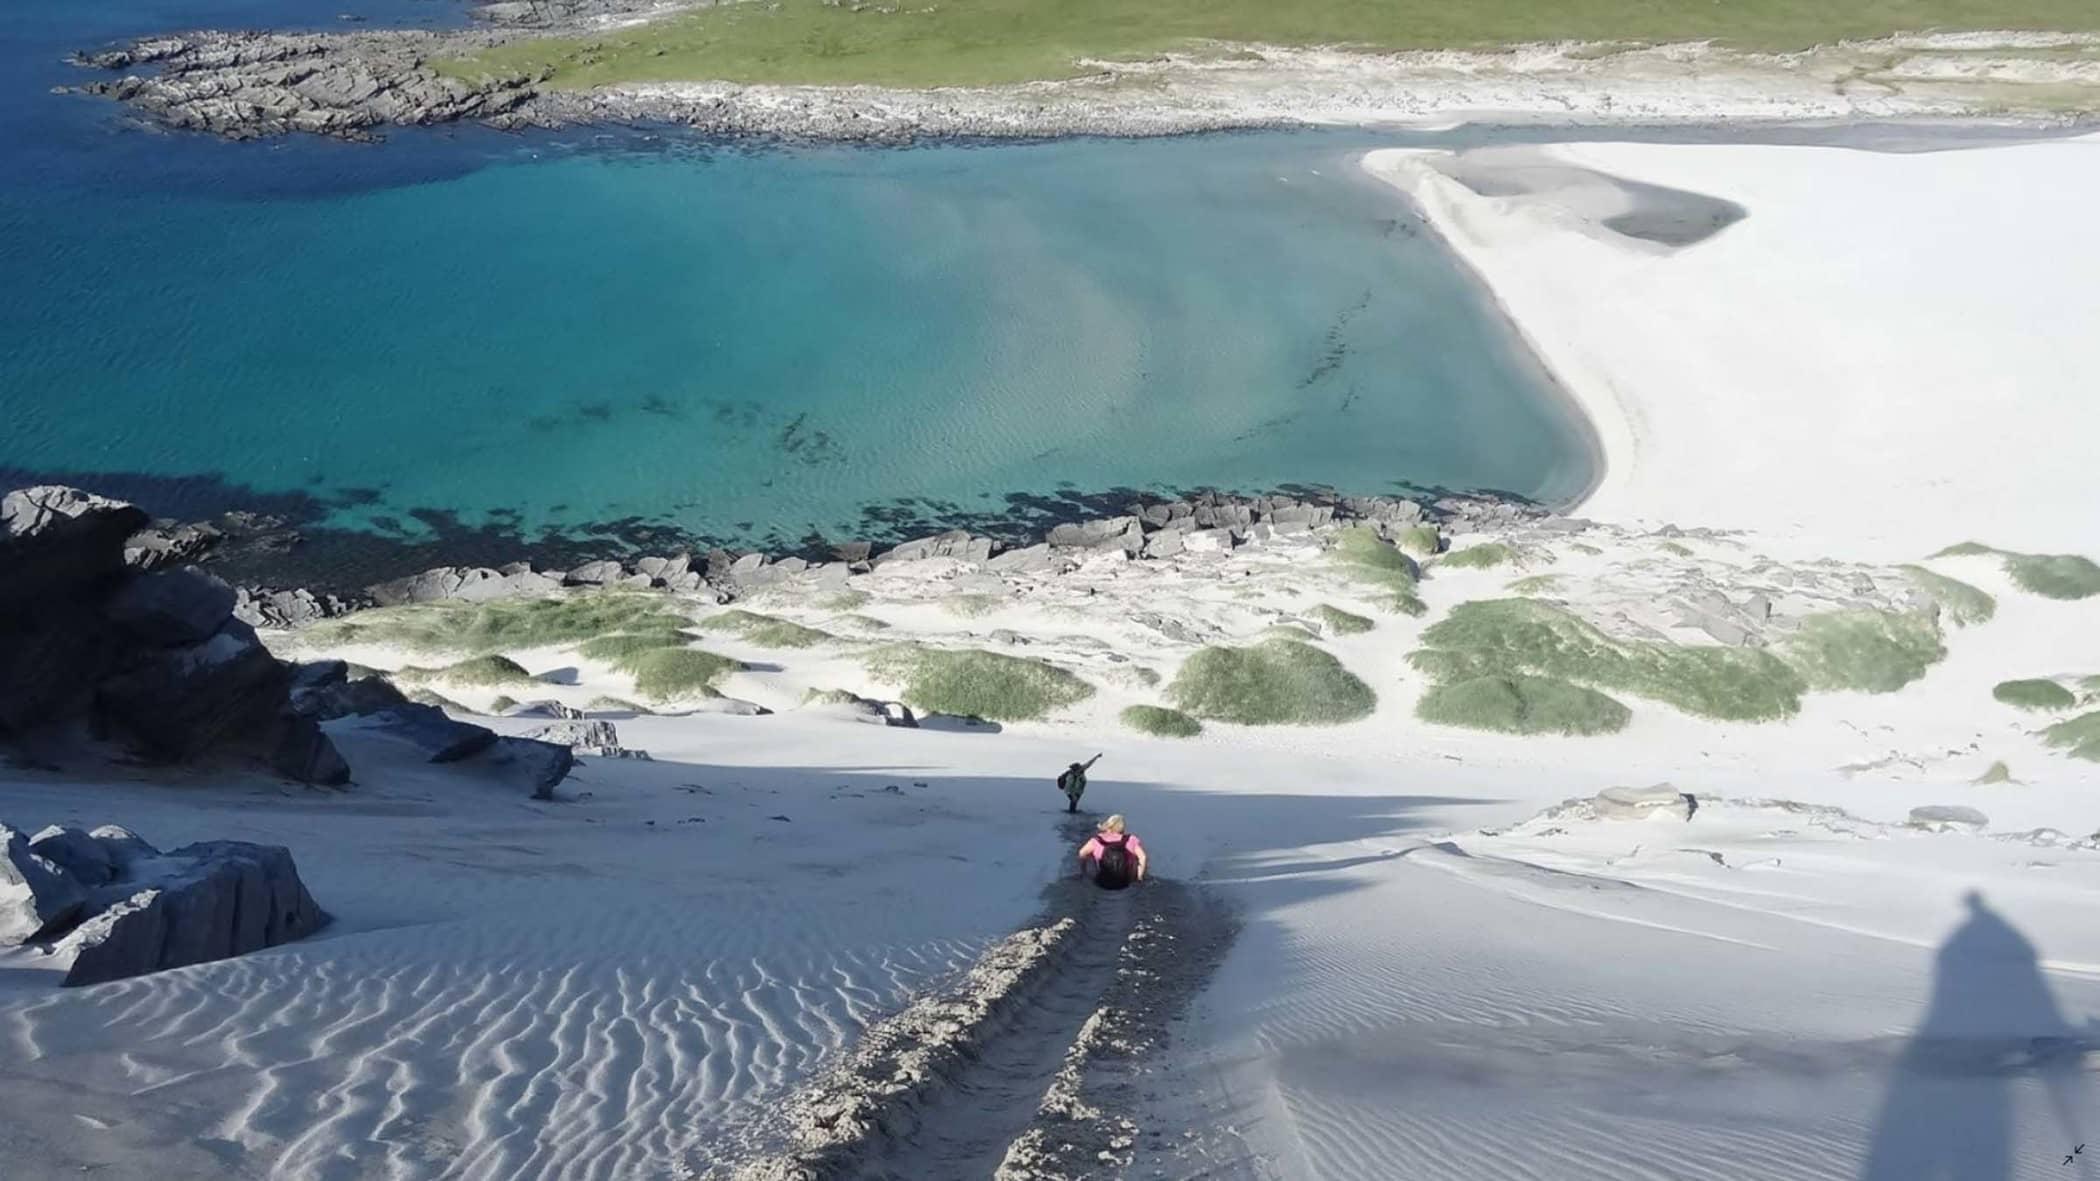 Sandfjellet pa Srya - Akkarfjord. Kreditering Per-Jonny Rehnlund.jpg